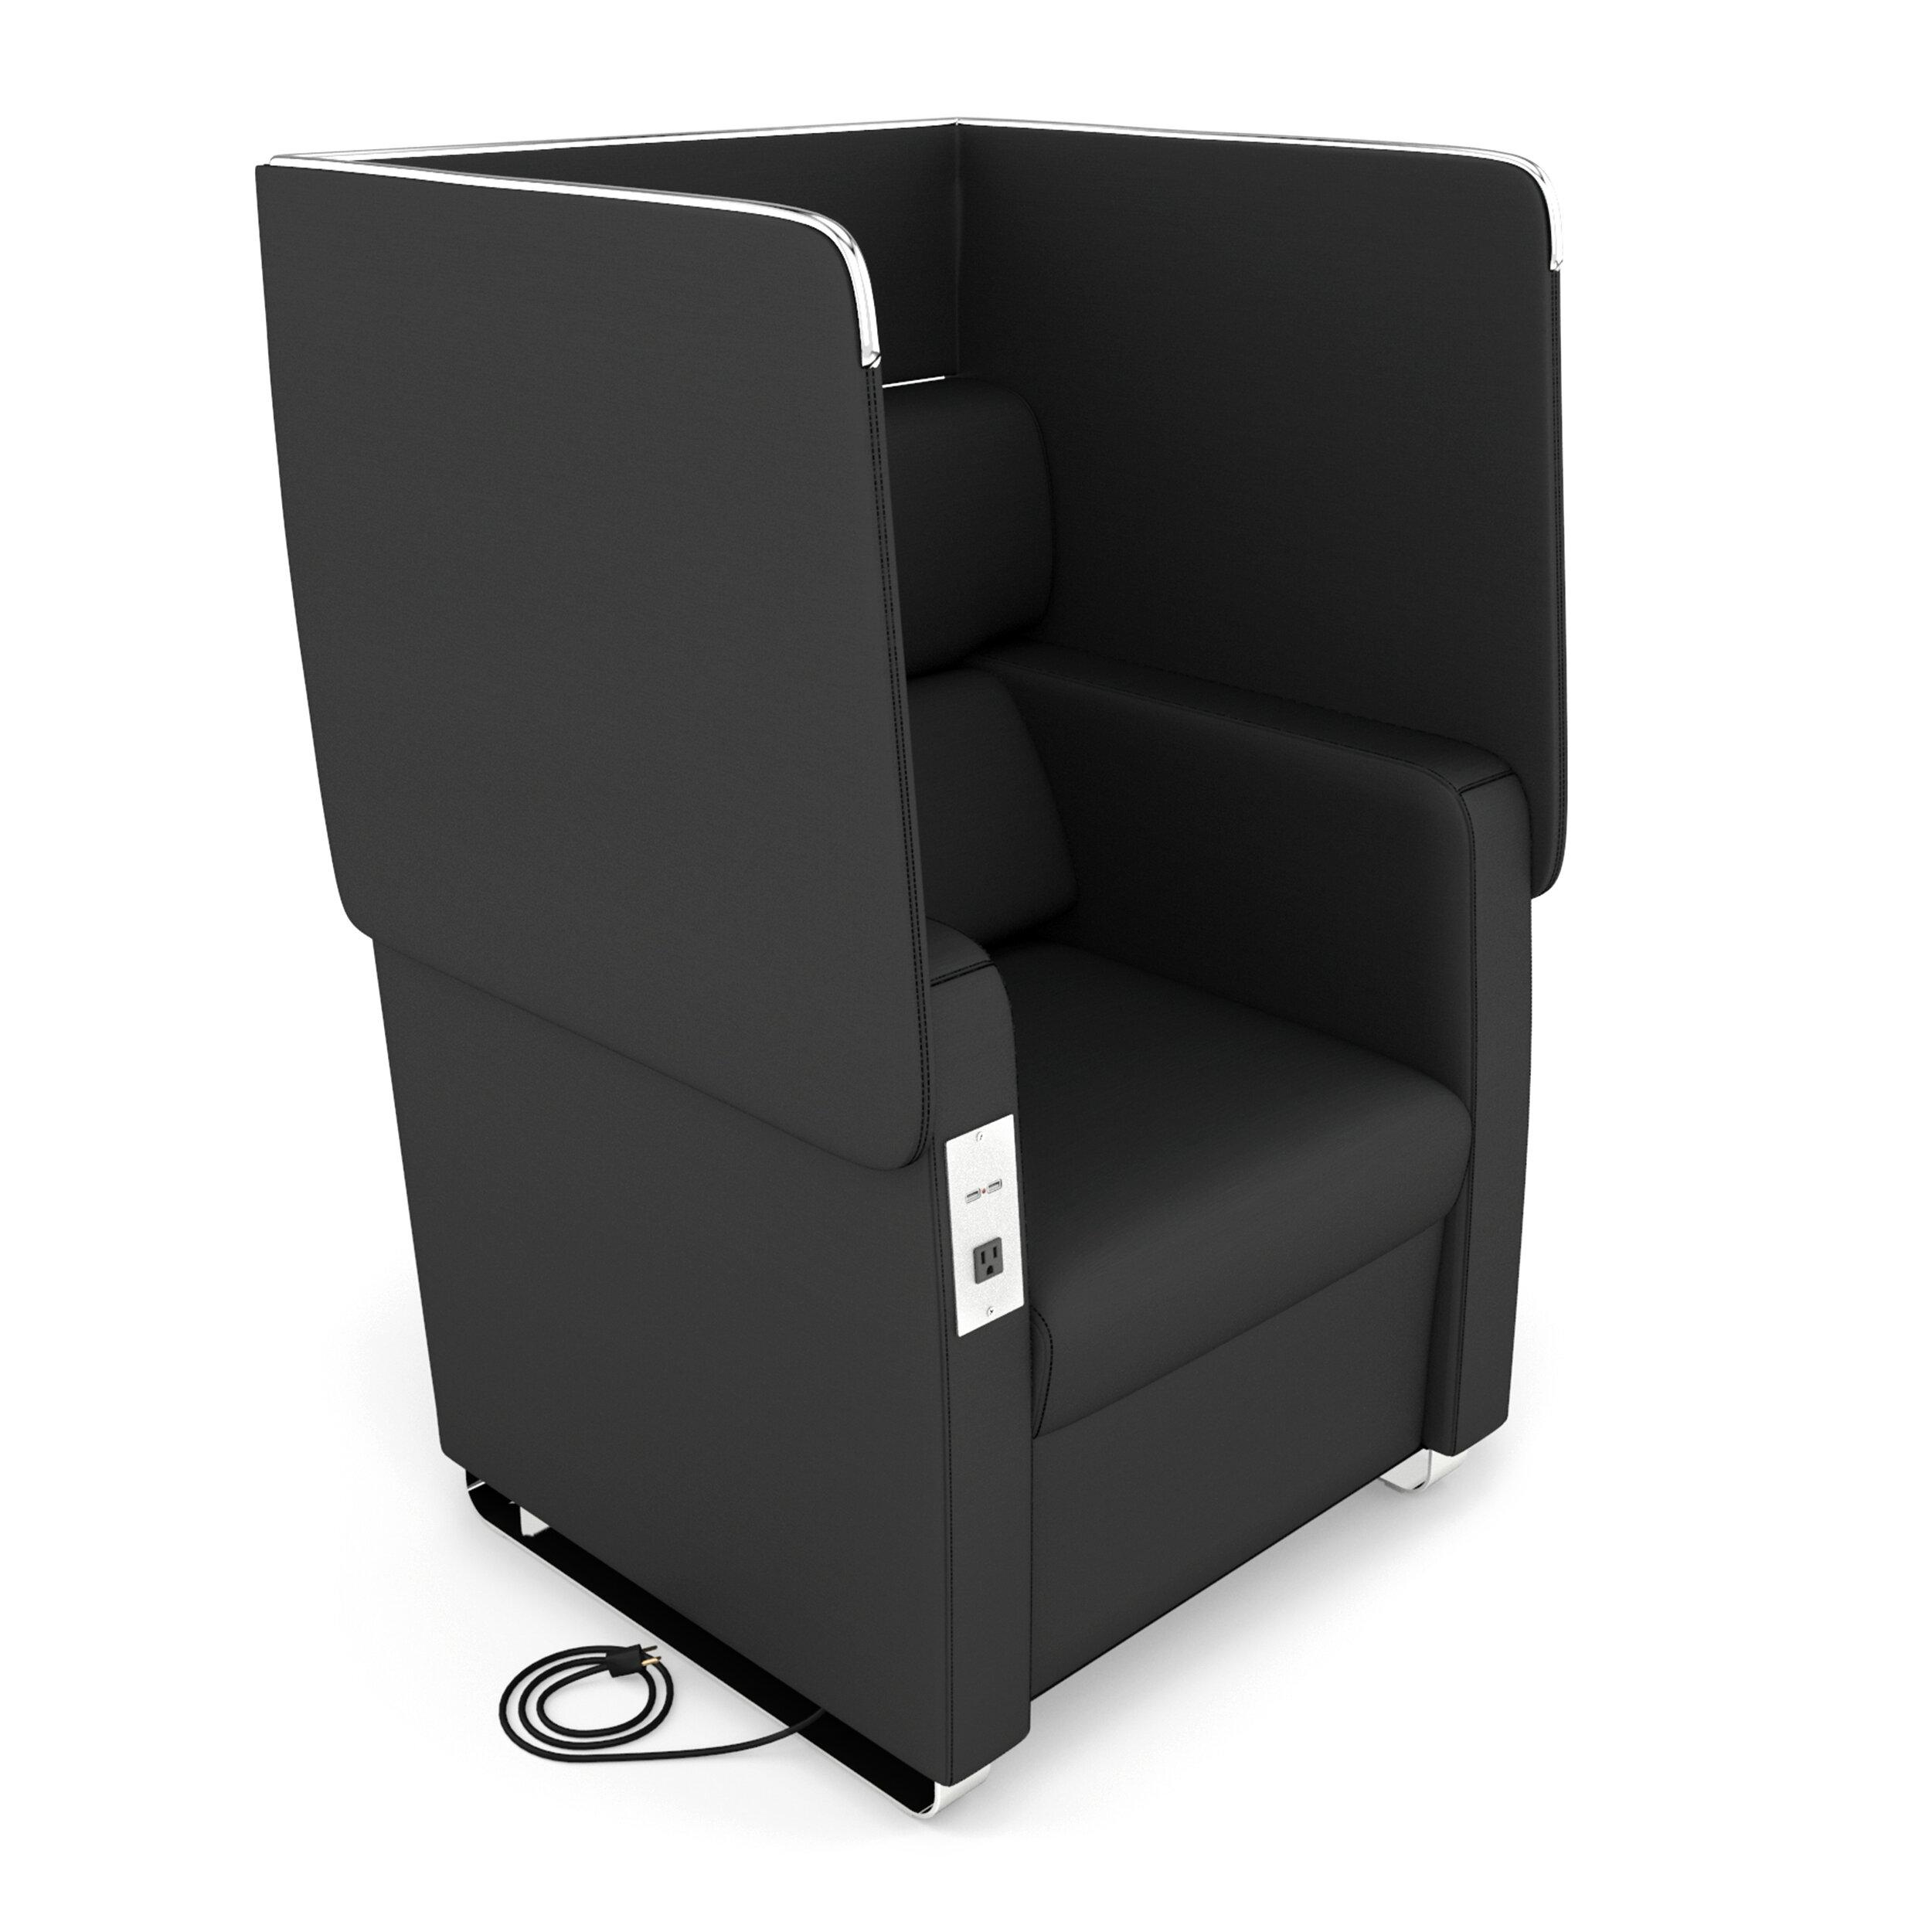 OFM Morph Series Soft Seating Convertible Chair | Wayfair